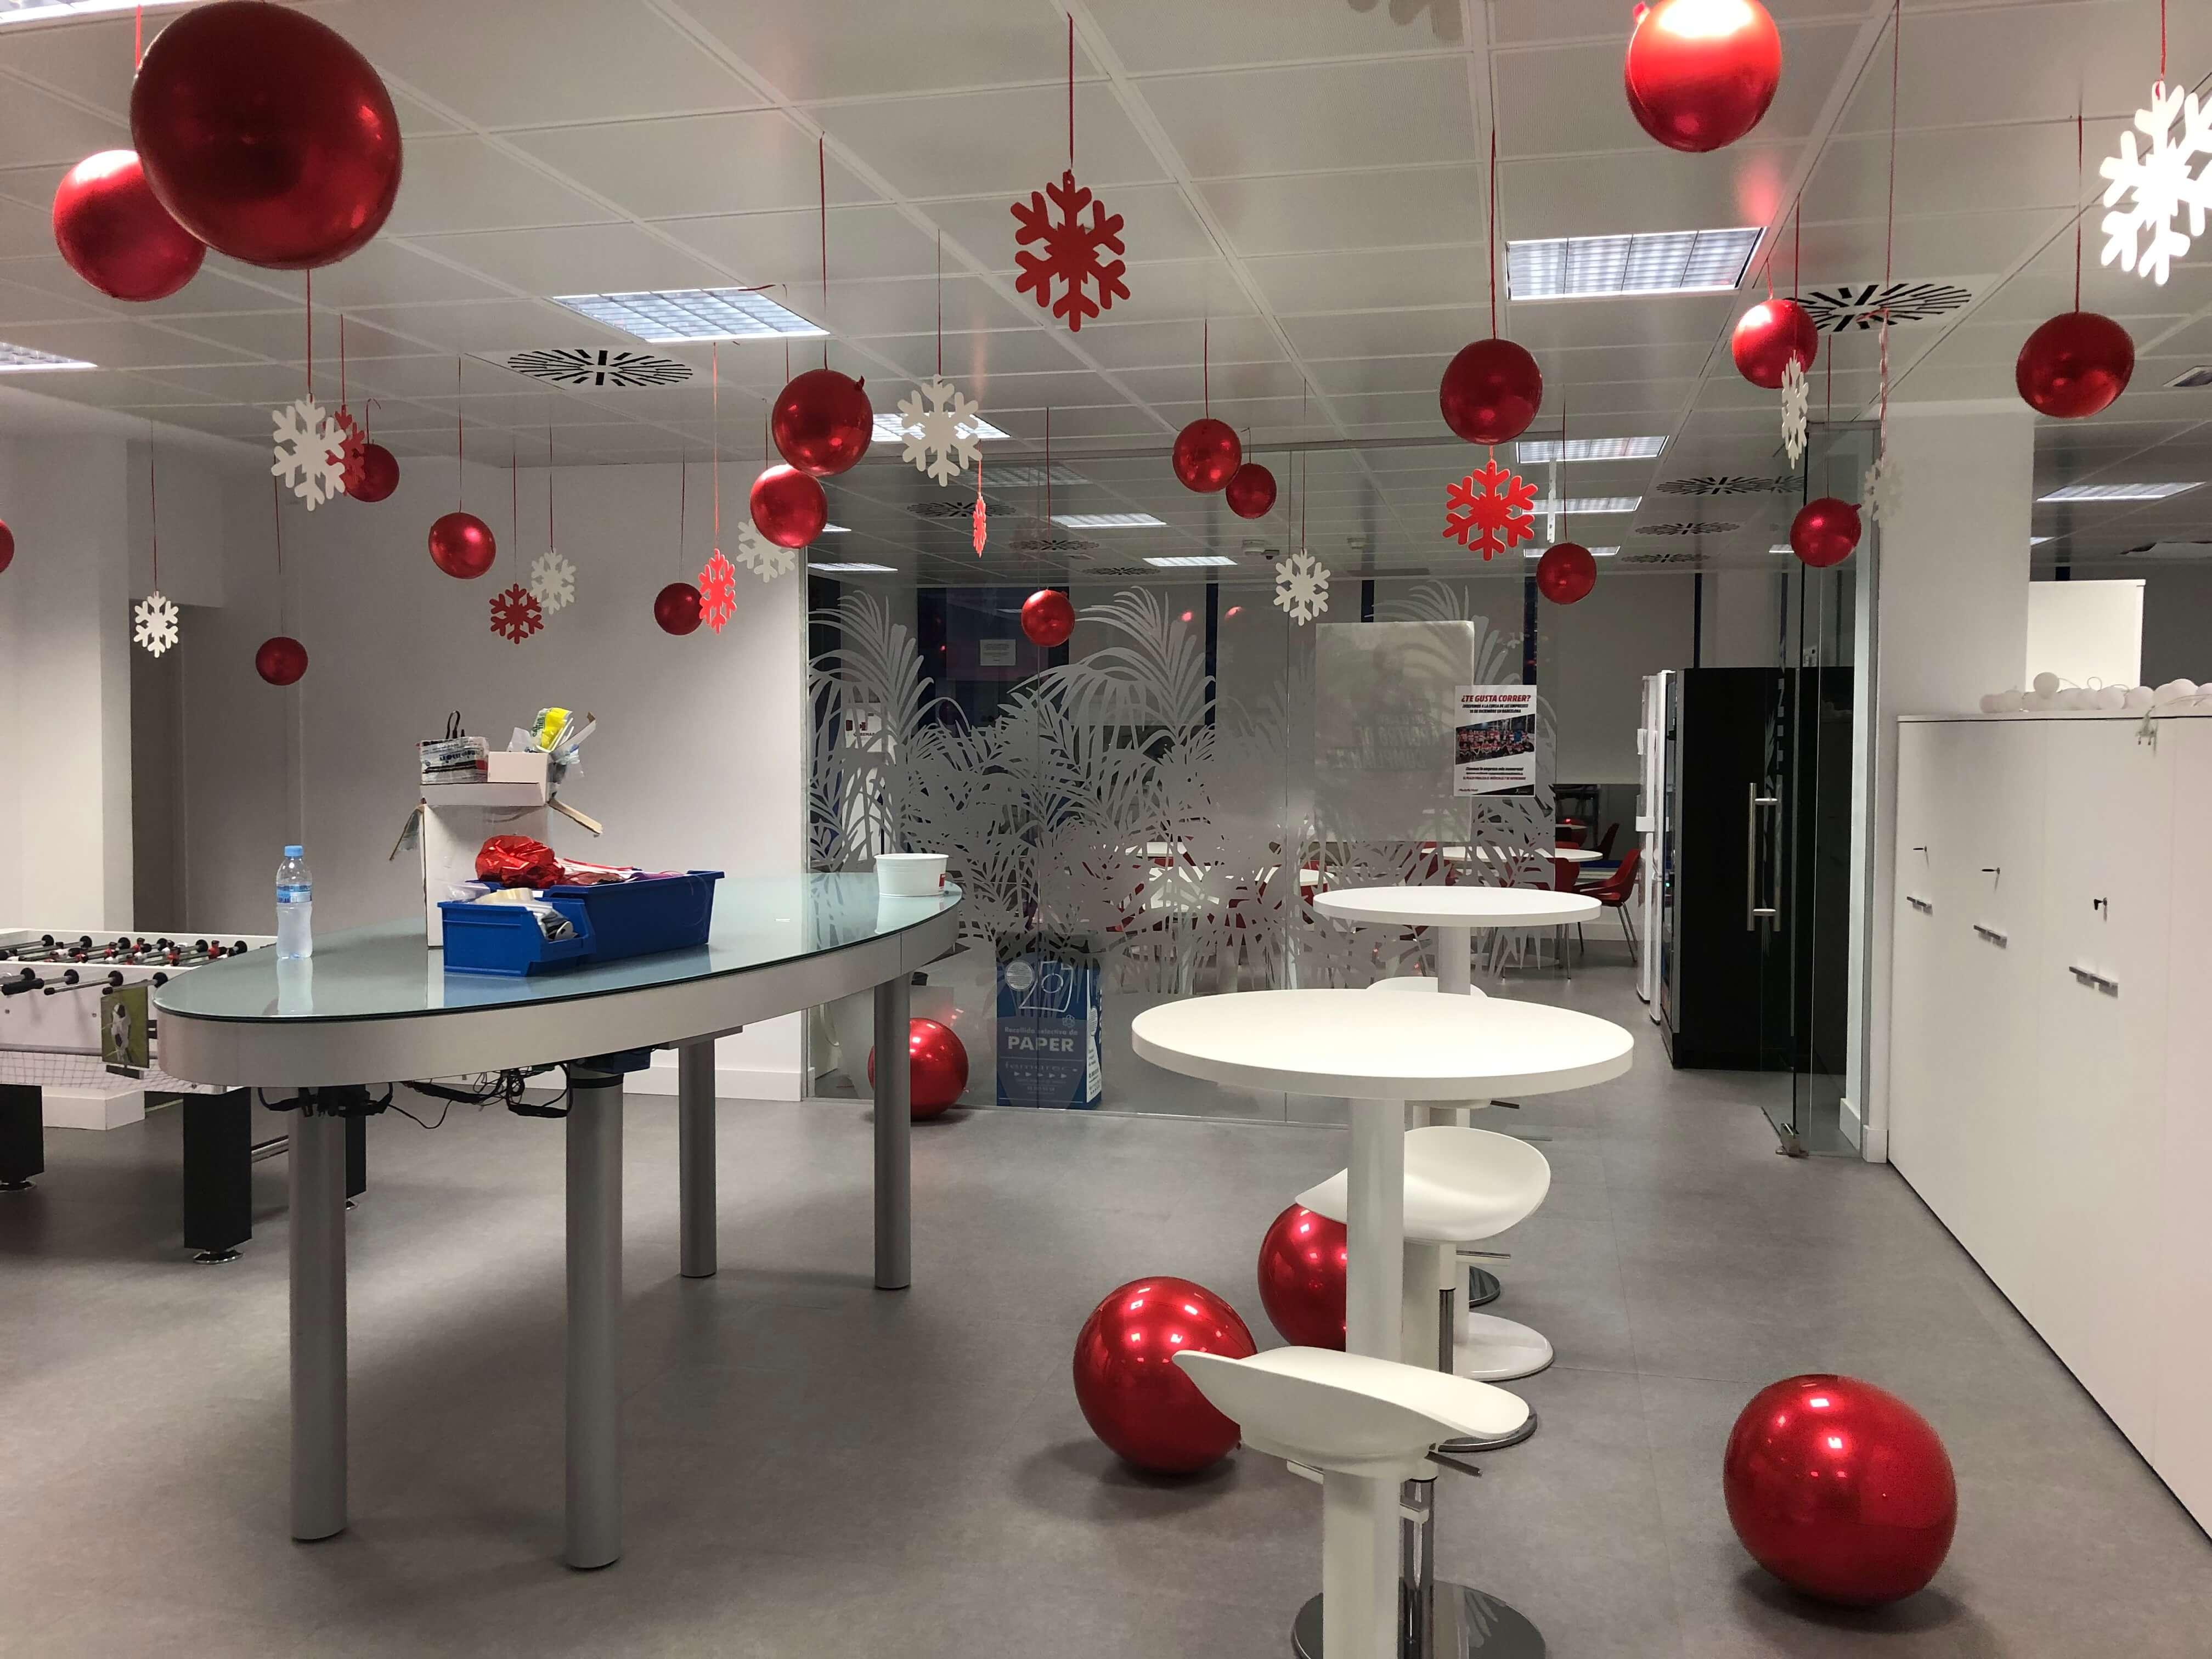 Decoraci n con globos oficina navidad giram n giram n - Decoracion de navidad para oficina ...